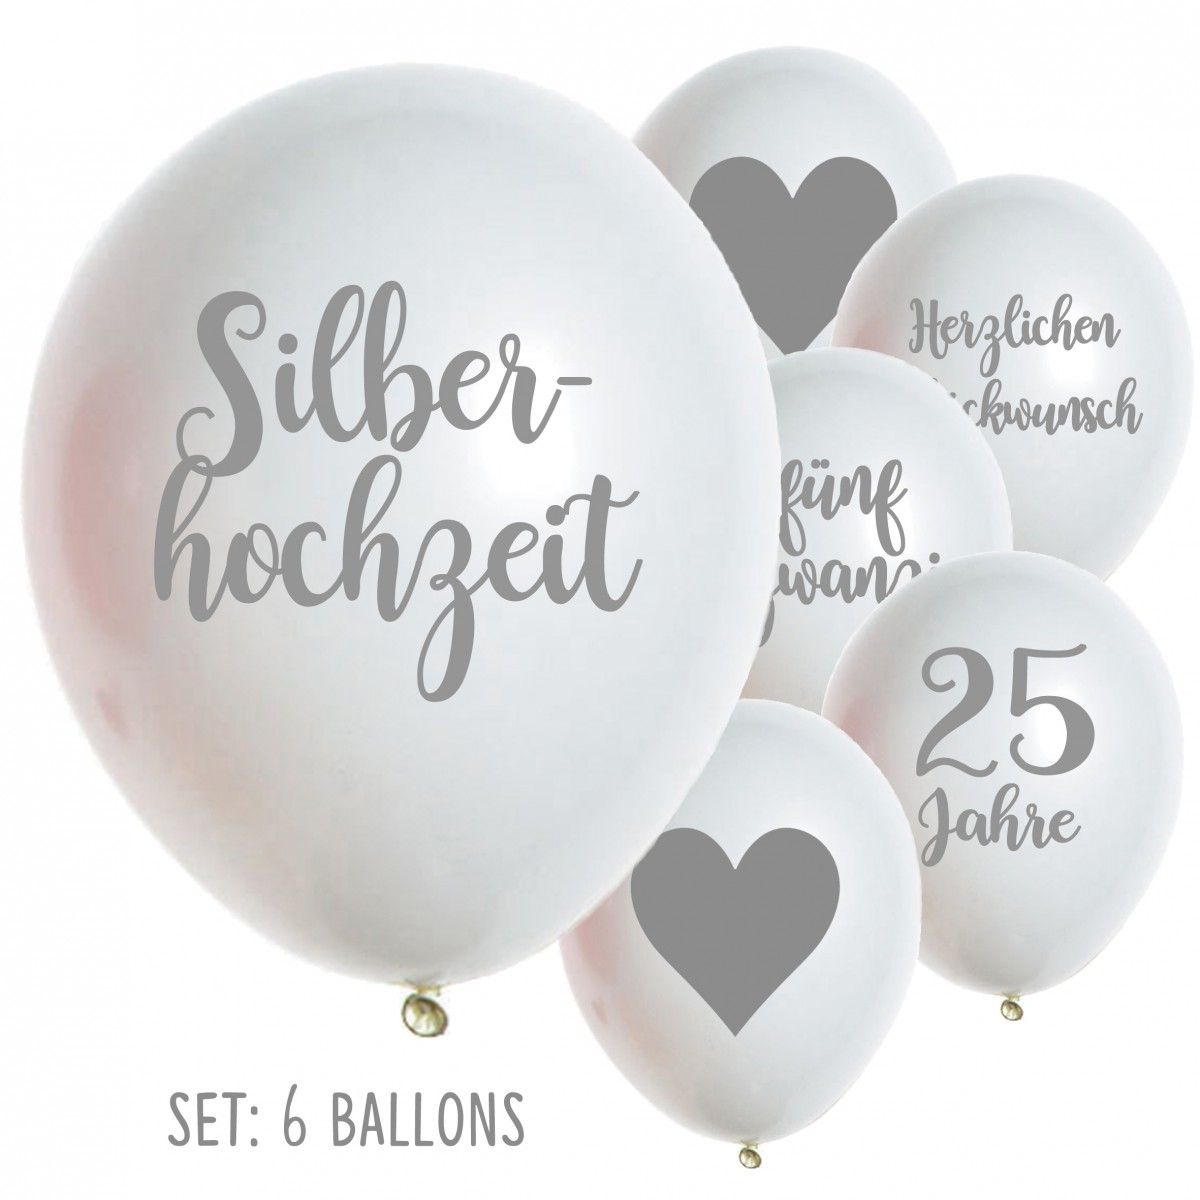 silberhochzeit ballons luftballons 25 jahre hochzeit jubil um ballon dekoration idee ideen. Black Bedroom Furniture Sets. Home Design Ideas